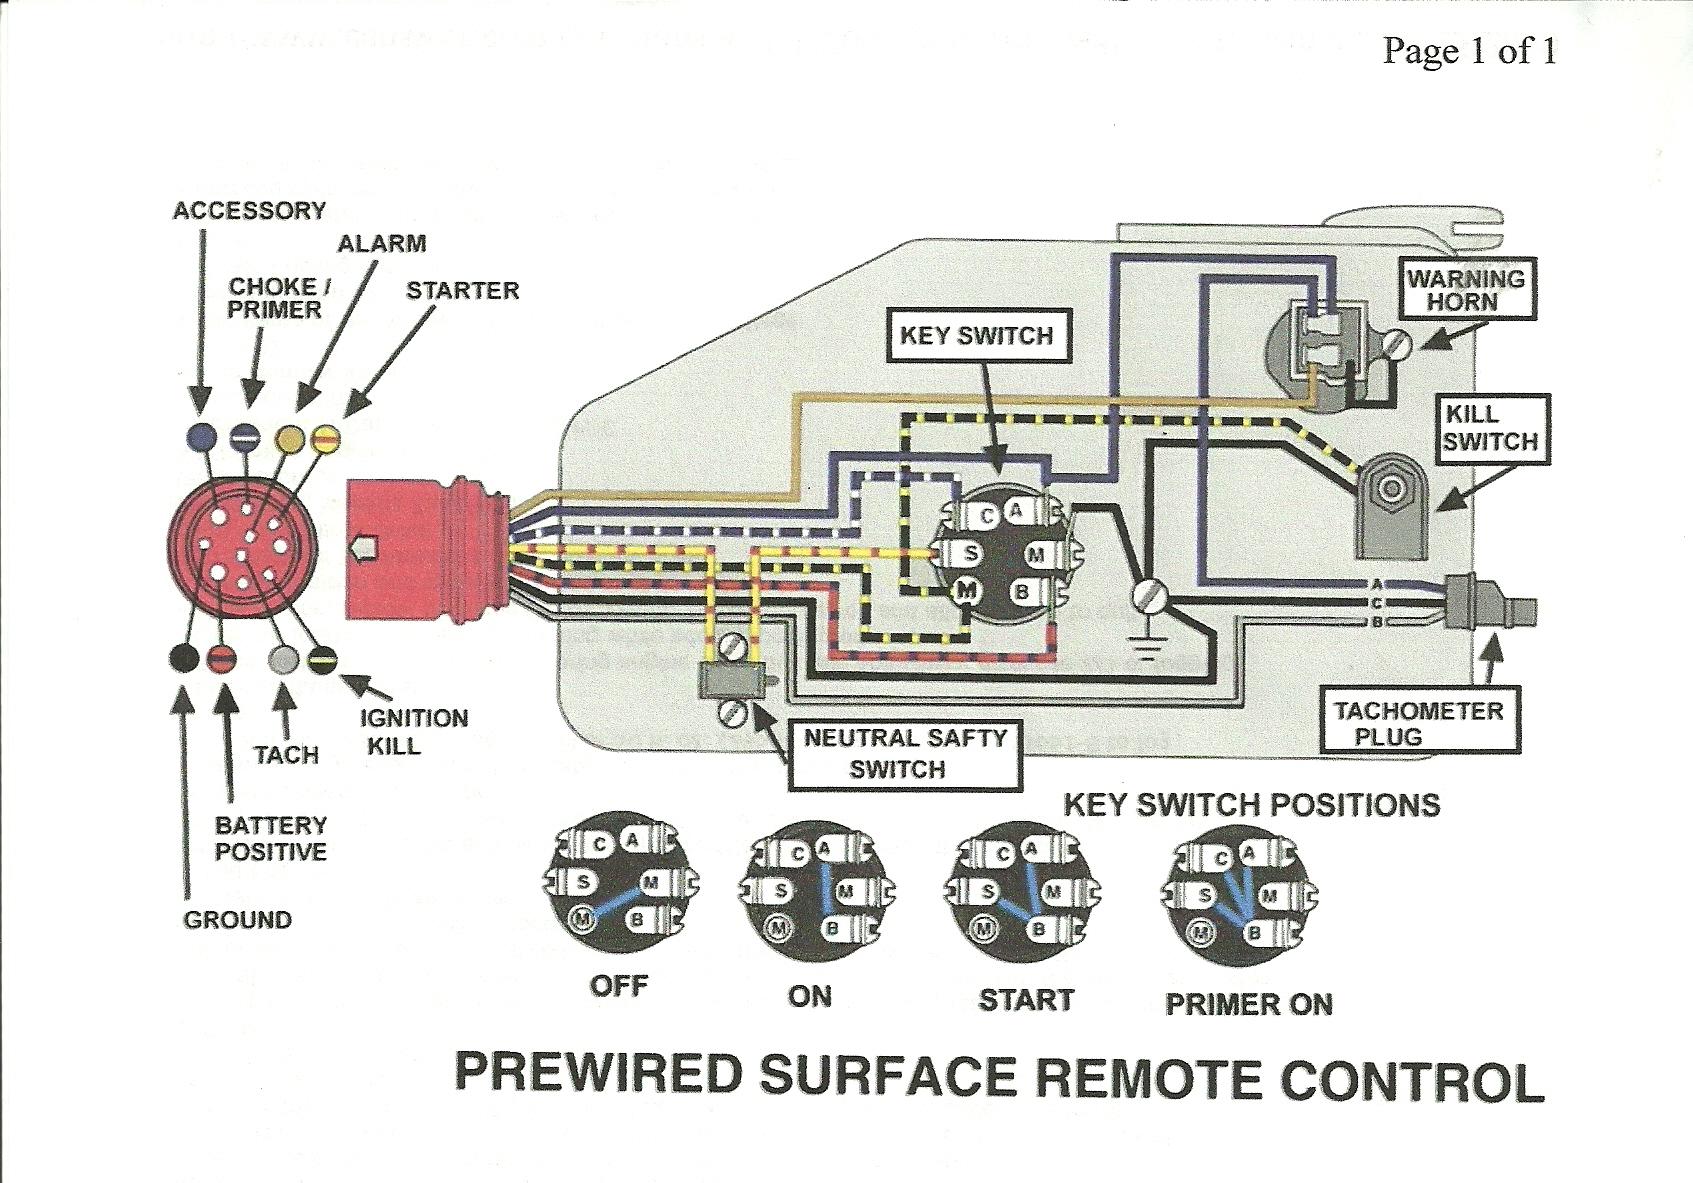 HK_9979] Evinrude 115 Hp Wiring Diagram Free Picture Wiring DiagramLeona Cran Xlexi Spoat Inoma Push Emba Mohammedshrine Librar Wiring 101